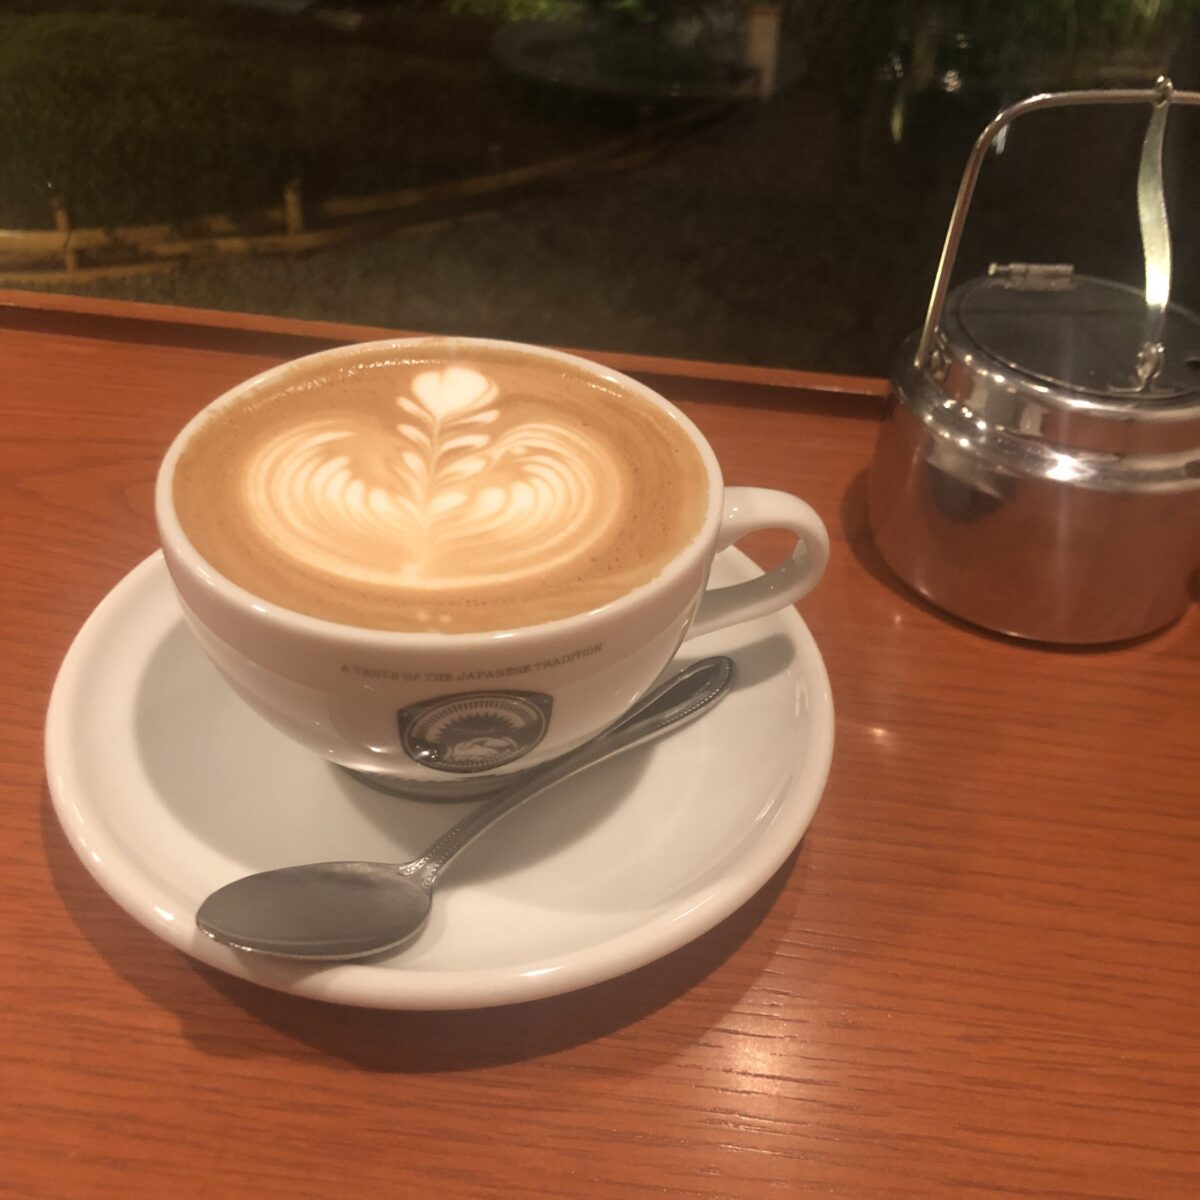 【KISSA MASTER(master-piece coffee kyoto)】庭園を望むおしゃれ和空間でくつろぐ、至福の時間 マキアート ¥490(税抜)